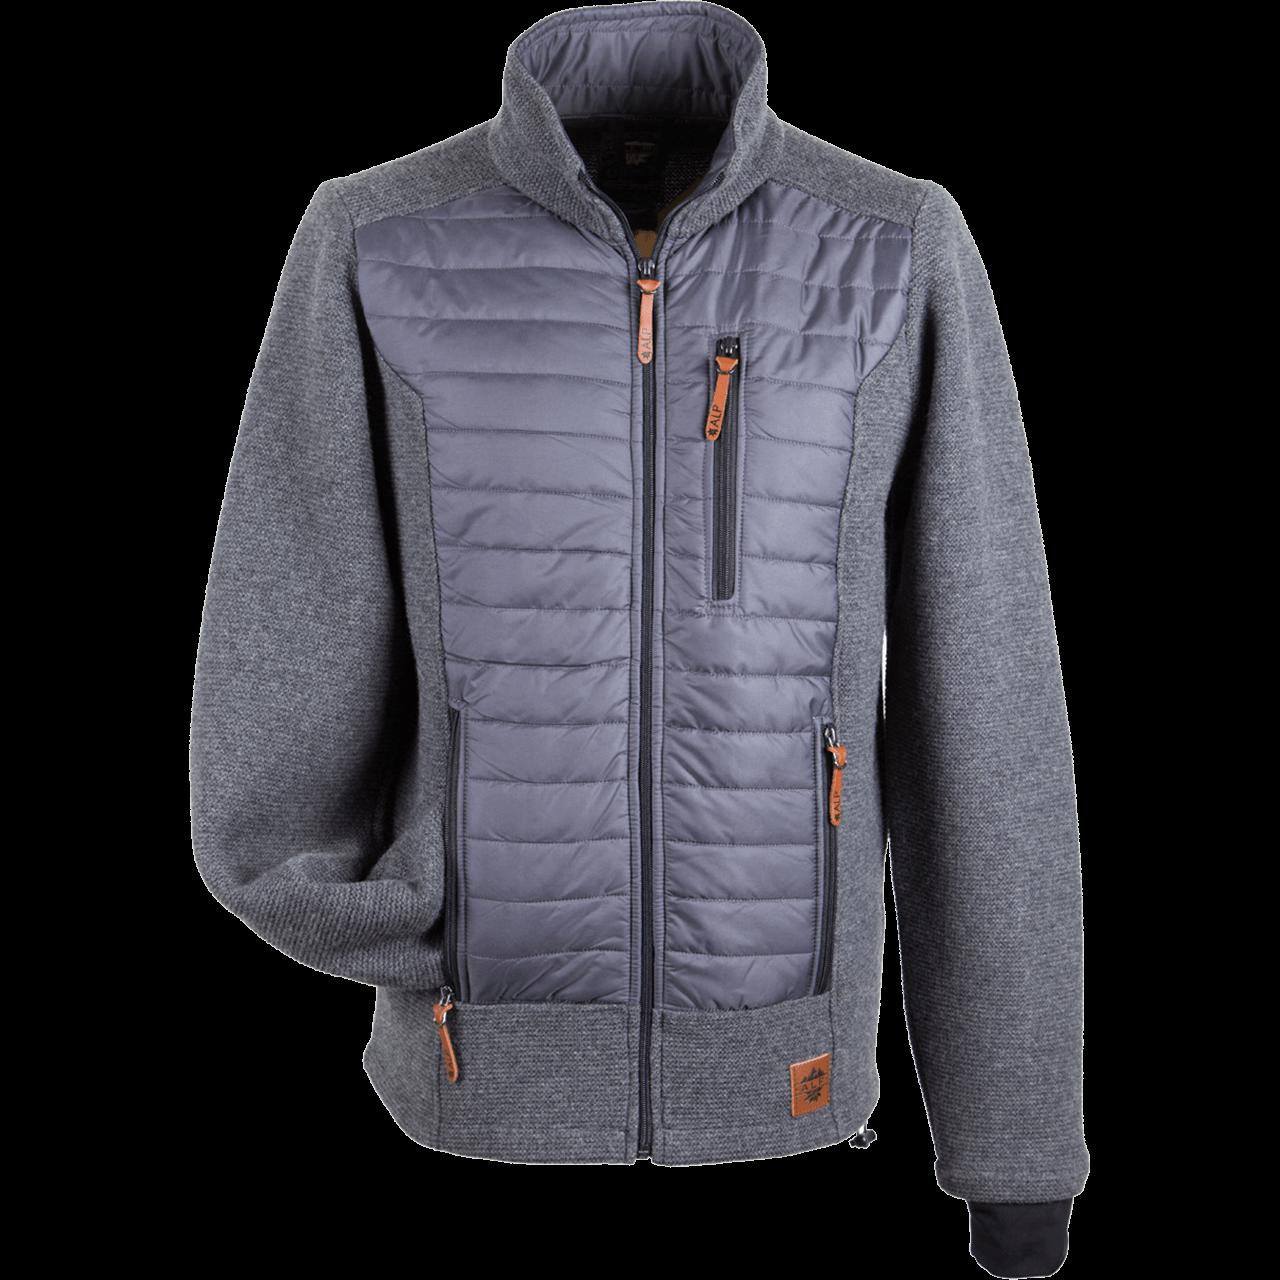 giacca-uomo-325001-alp1964